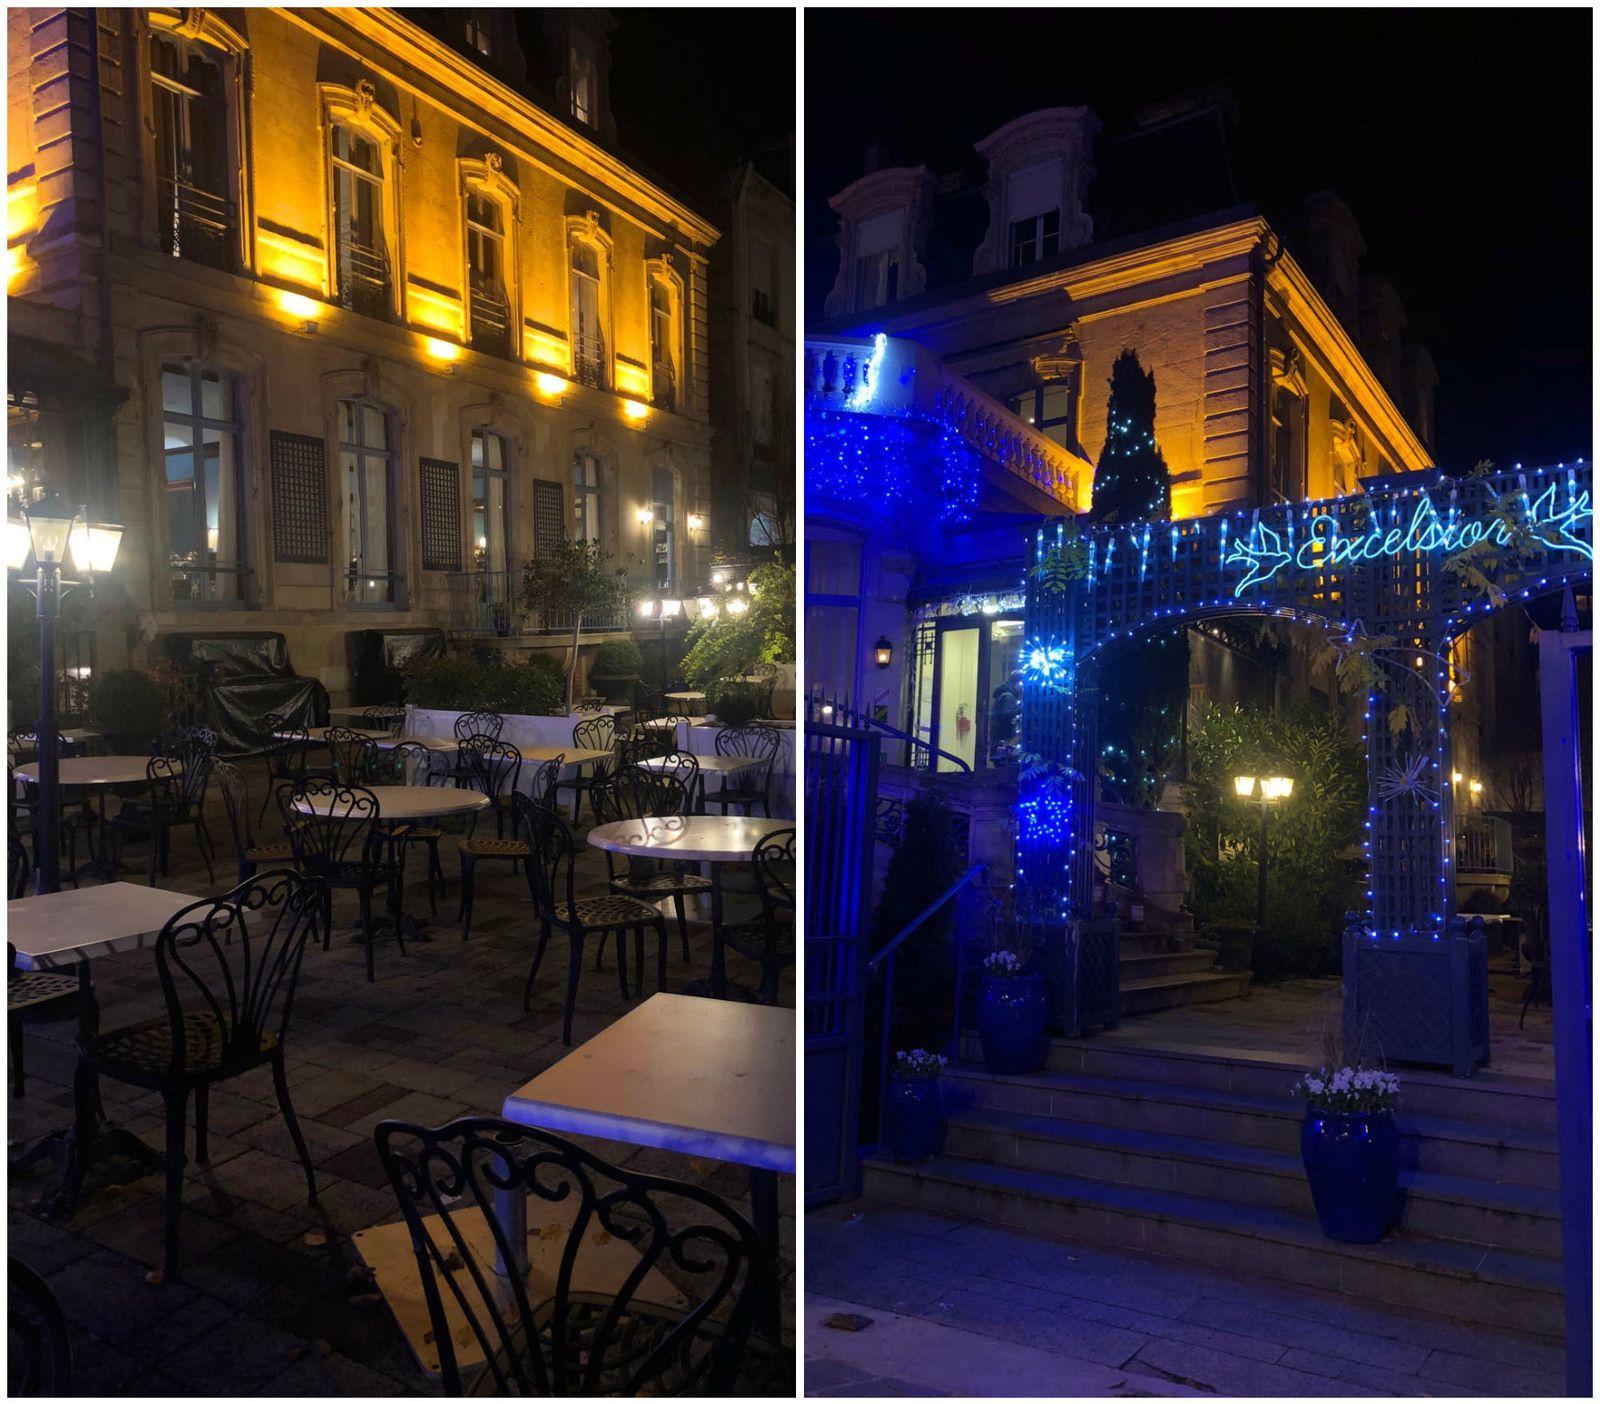 Brasserie Flo Excelsior sur Reims